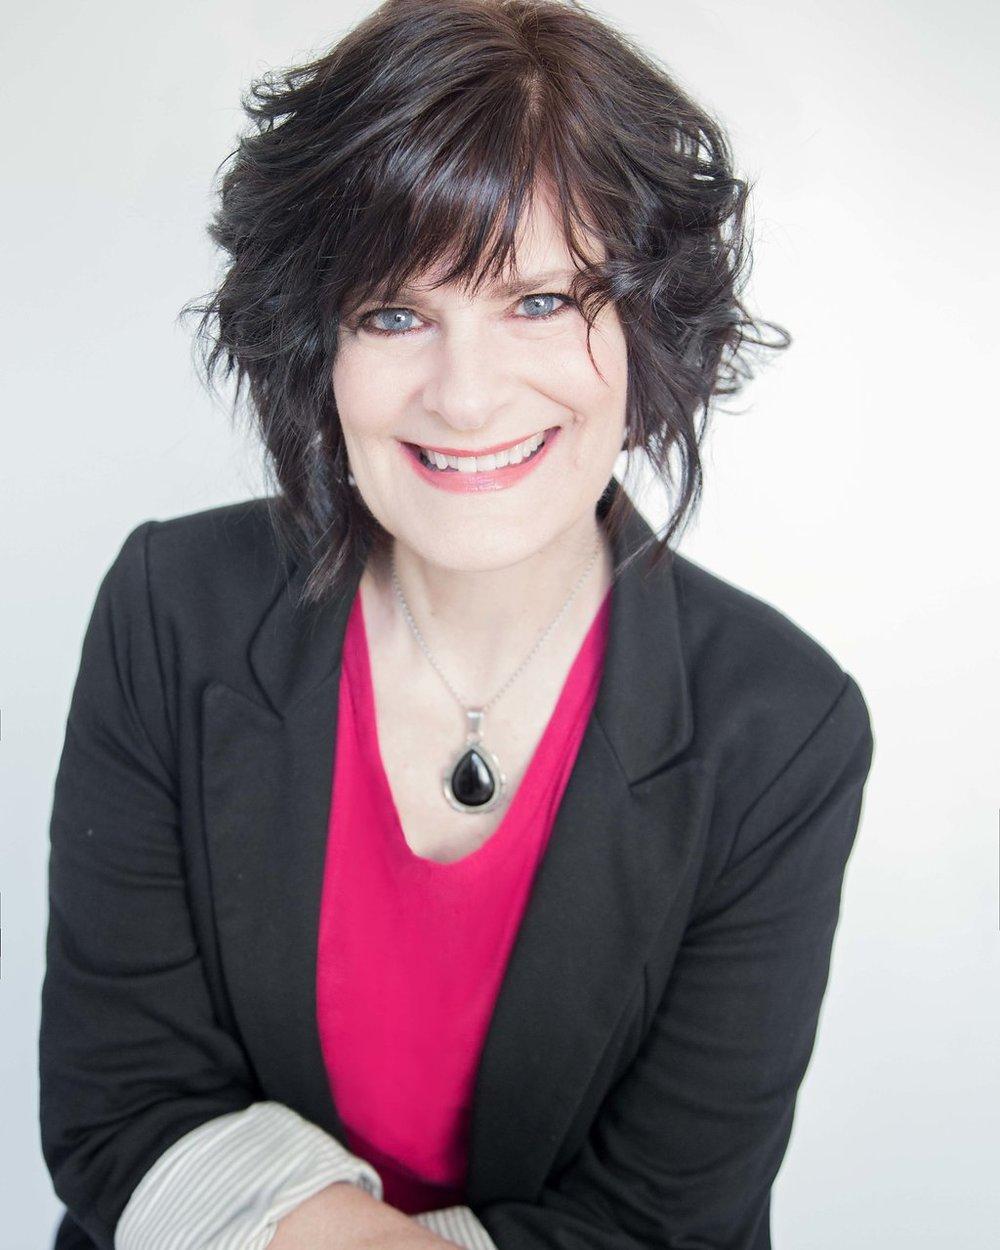 Stacy Dymalski, writer-performer